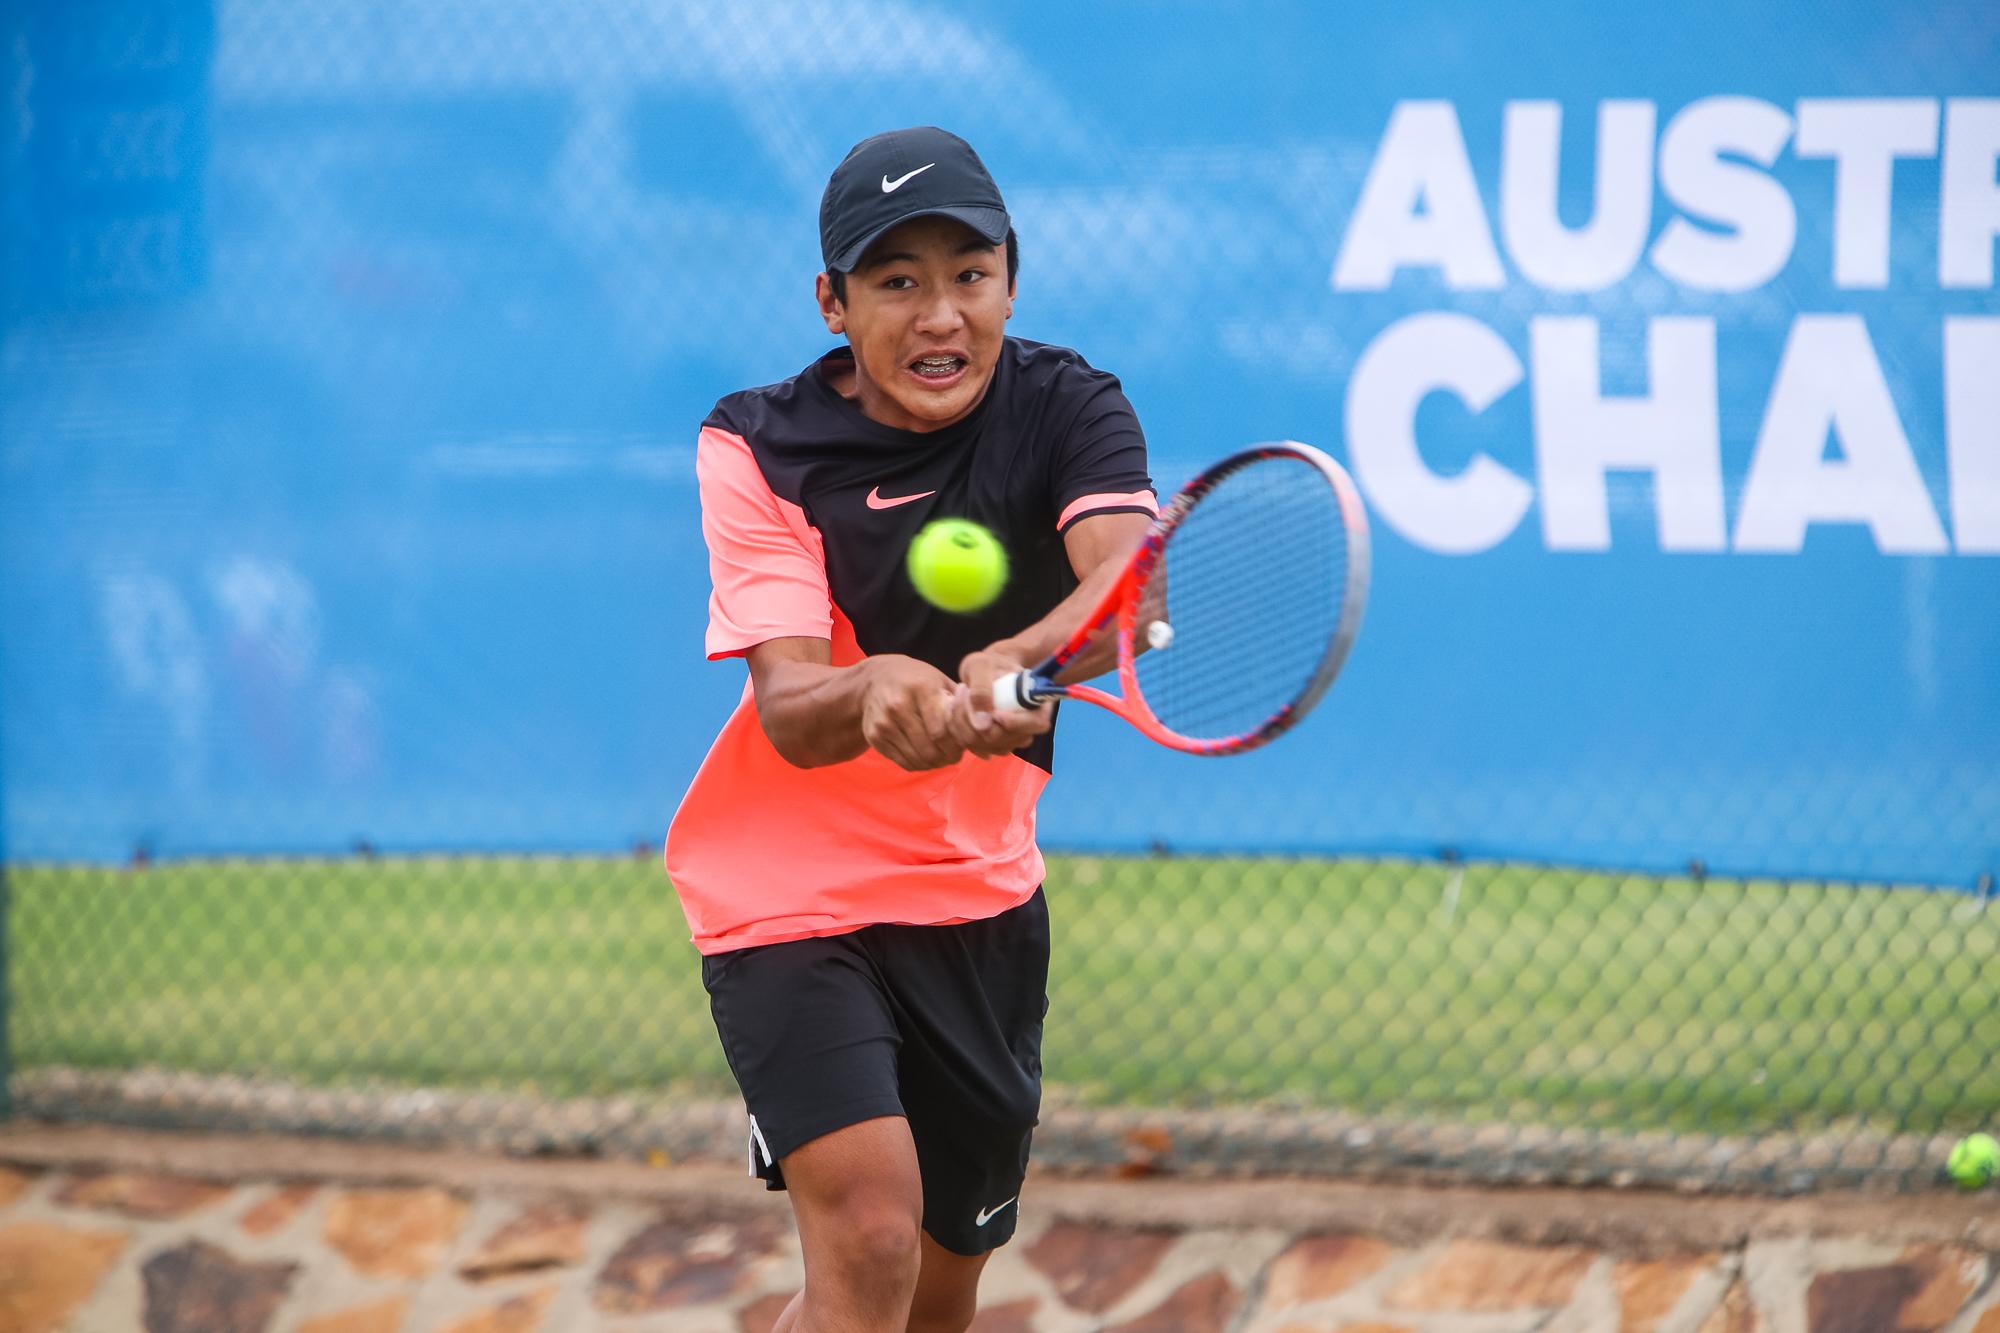 Edward Vo Wins Second Australian Grasscourt Championship 17 April 2018 Tennis Sa